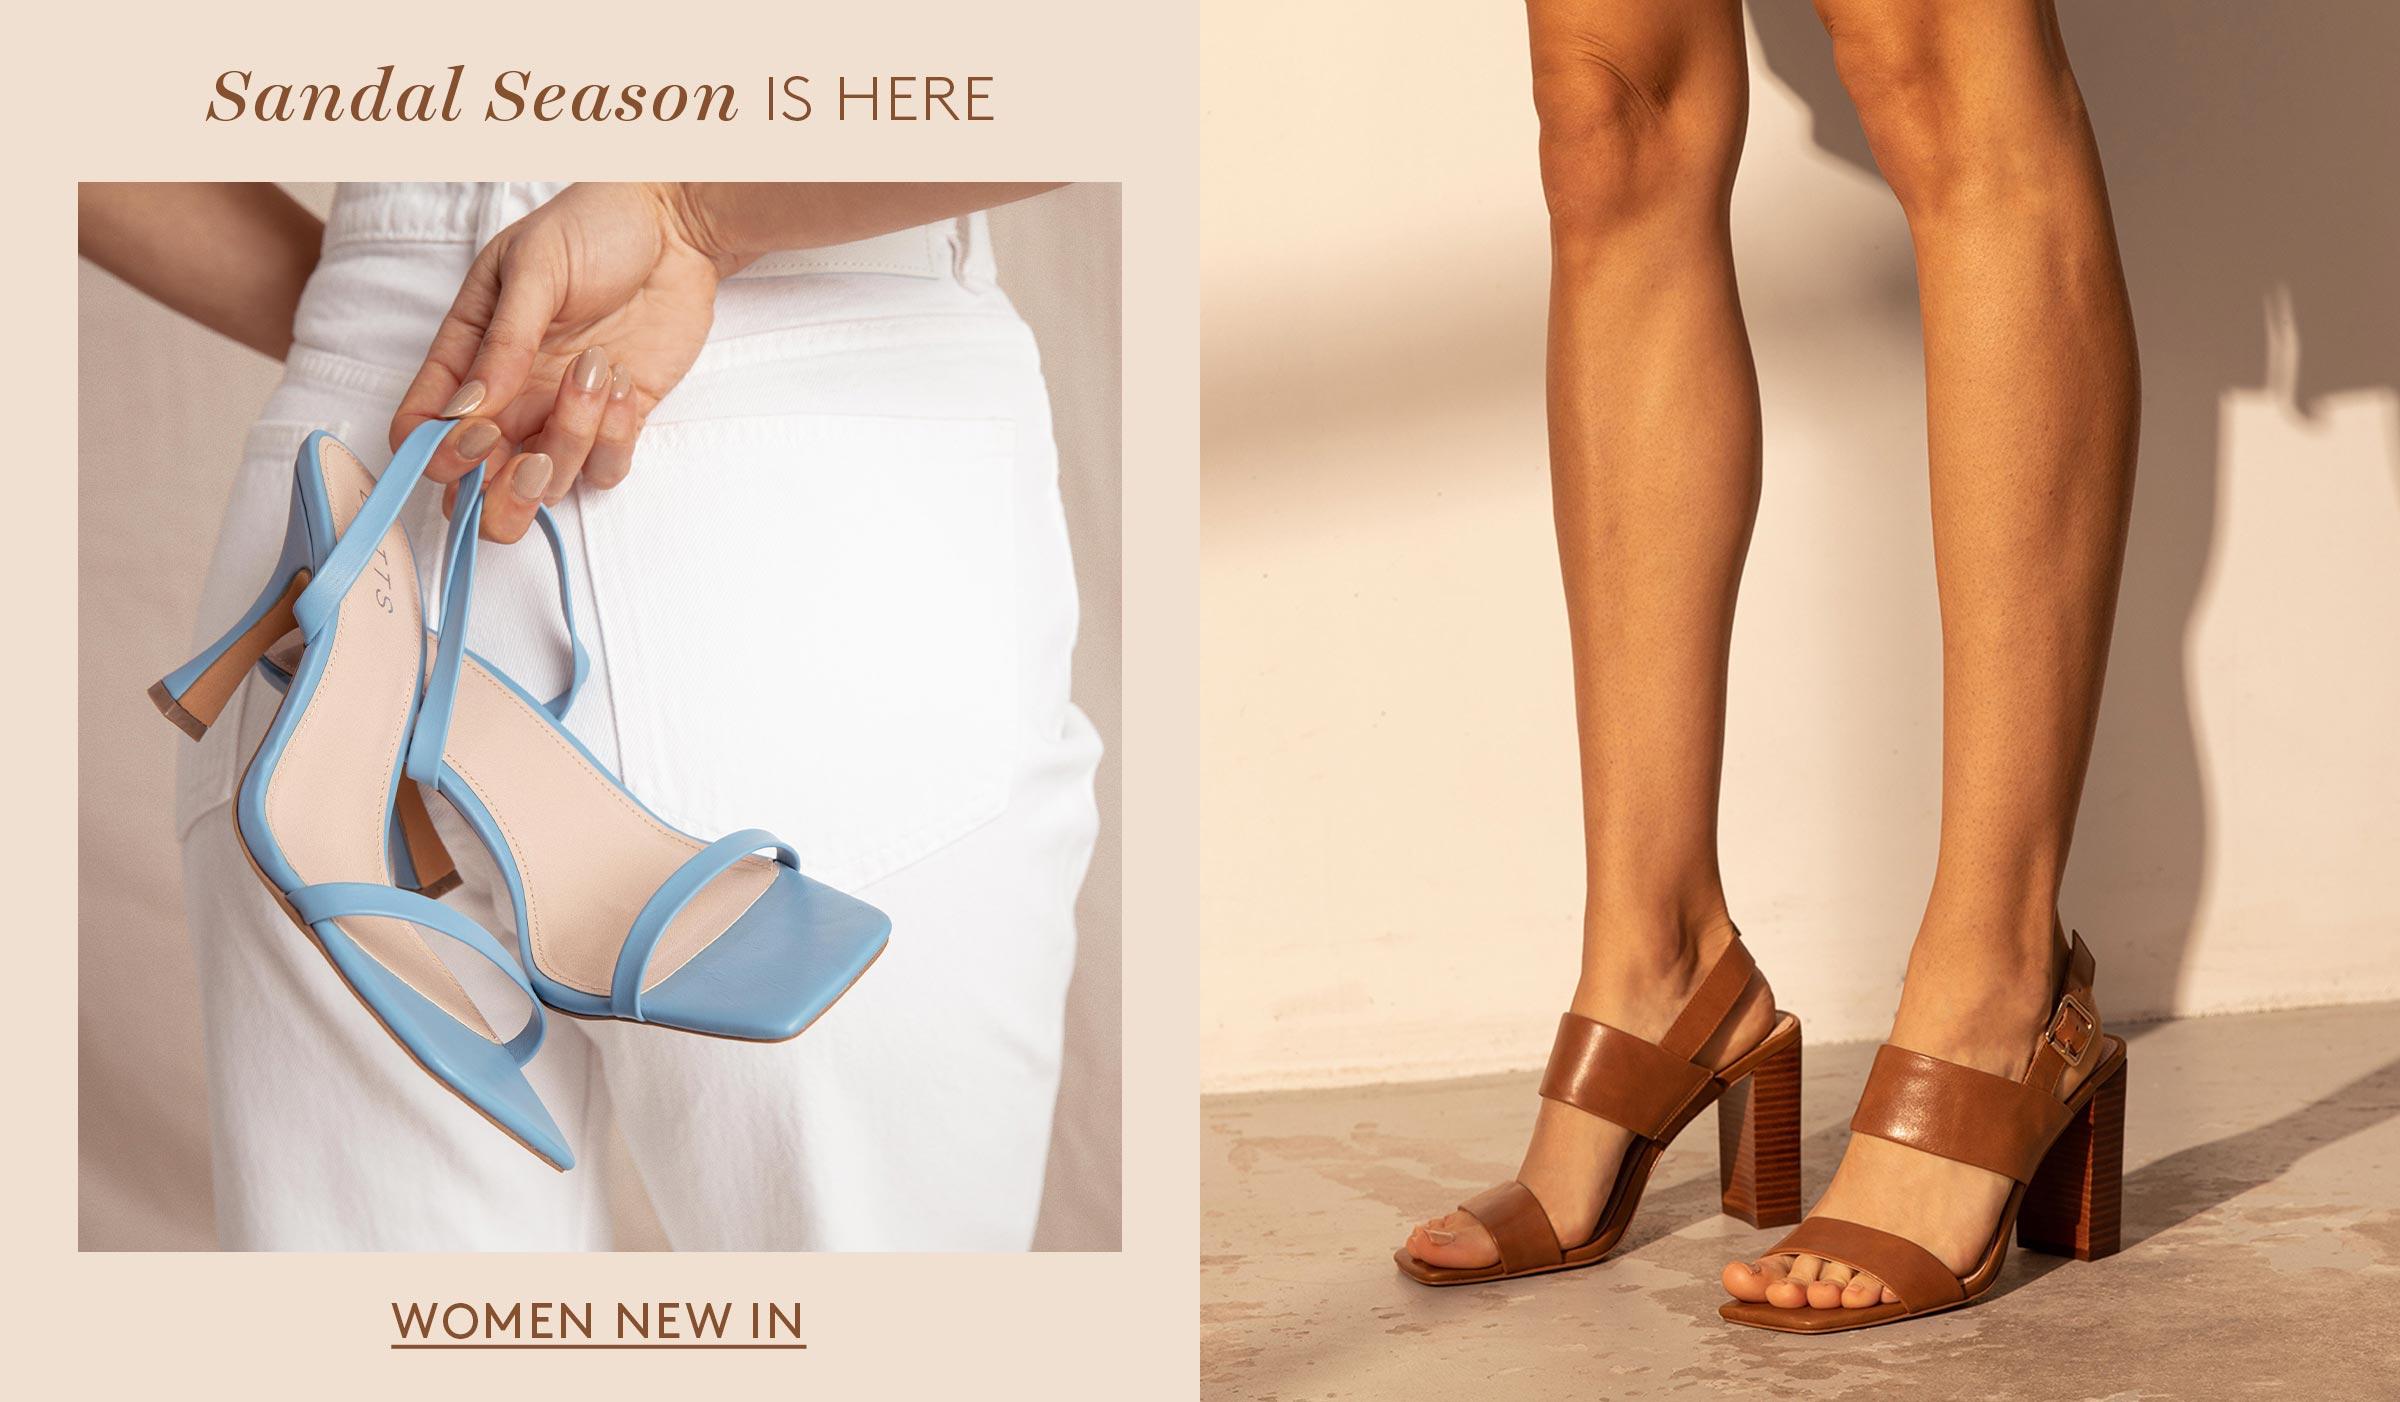 BETTS   Women's Sandals   NEW Arrivals   hmpg banner 2400 x 1402